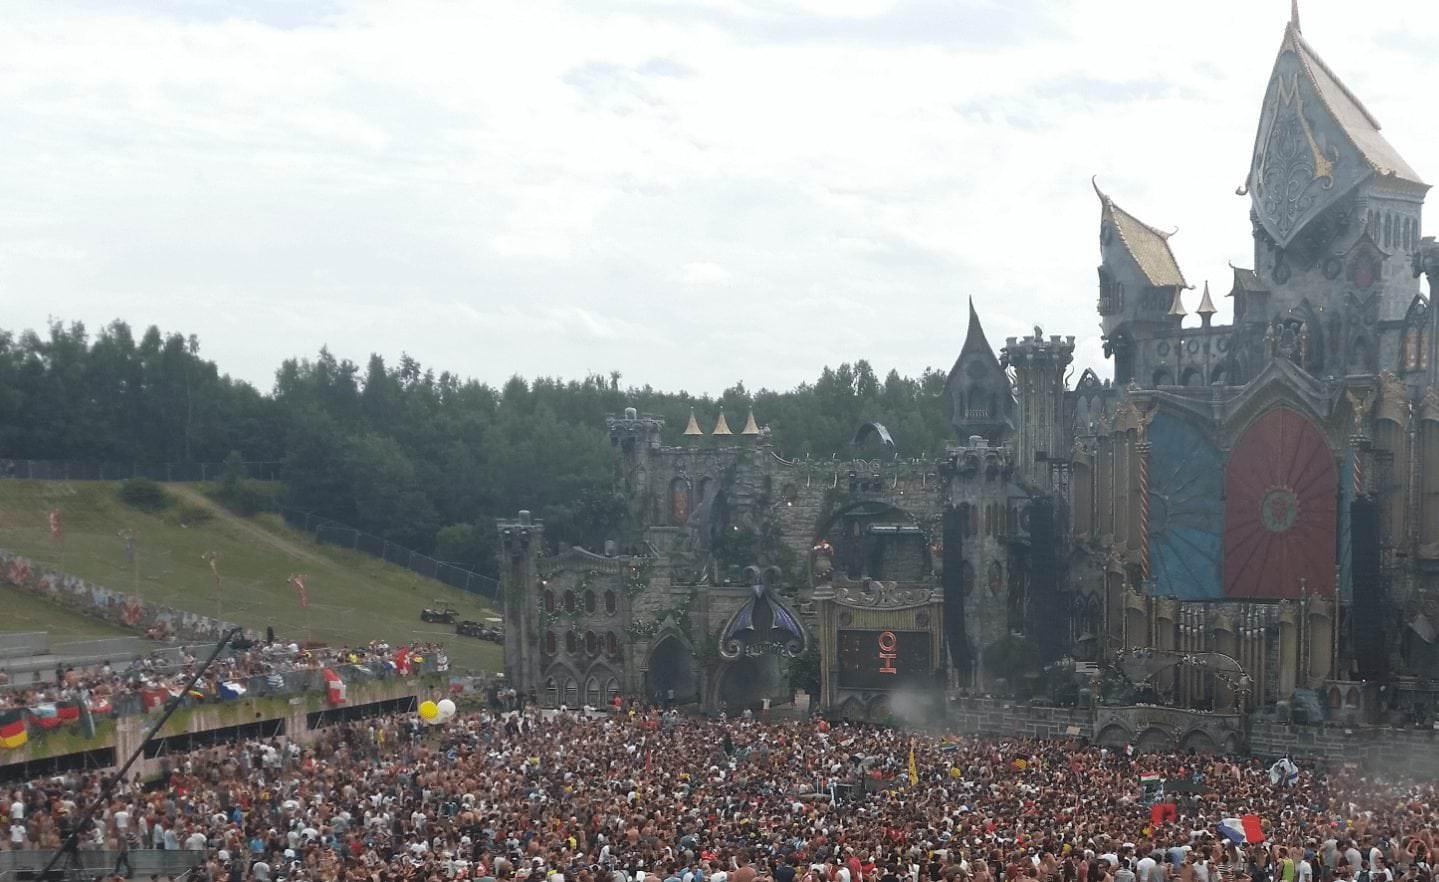 Sinnexplosion goes Tomorrowland